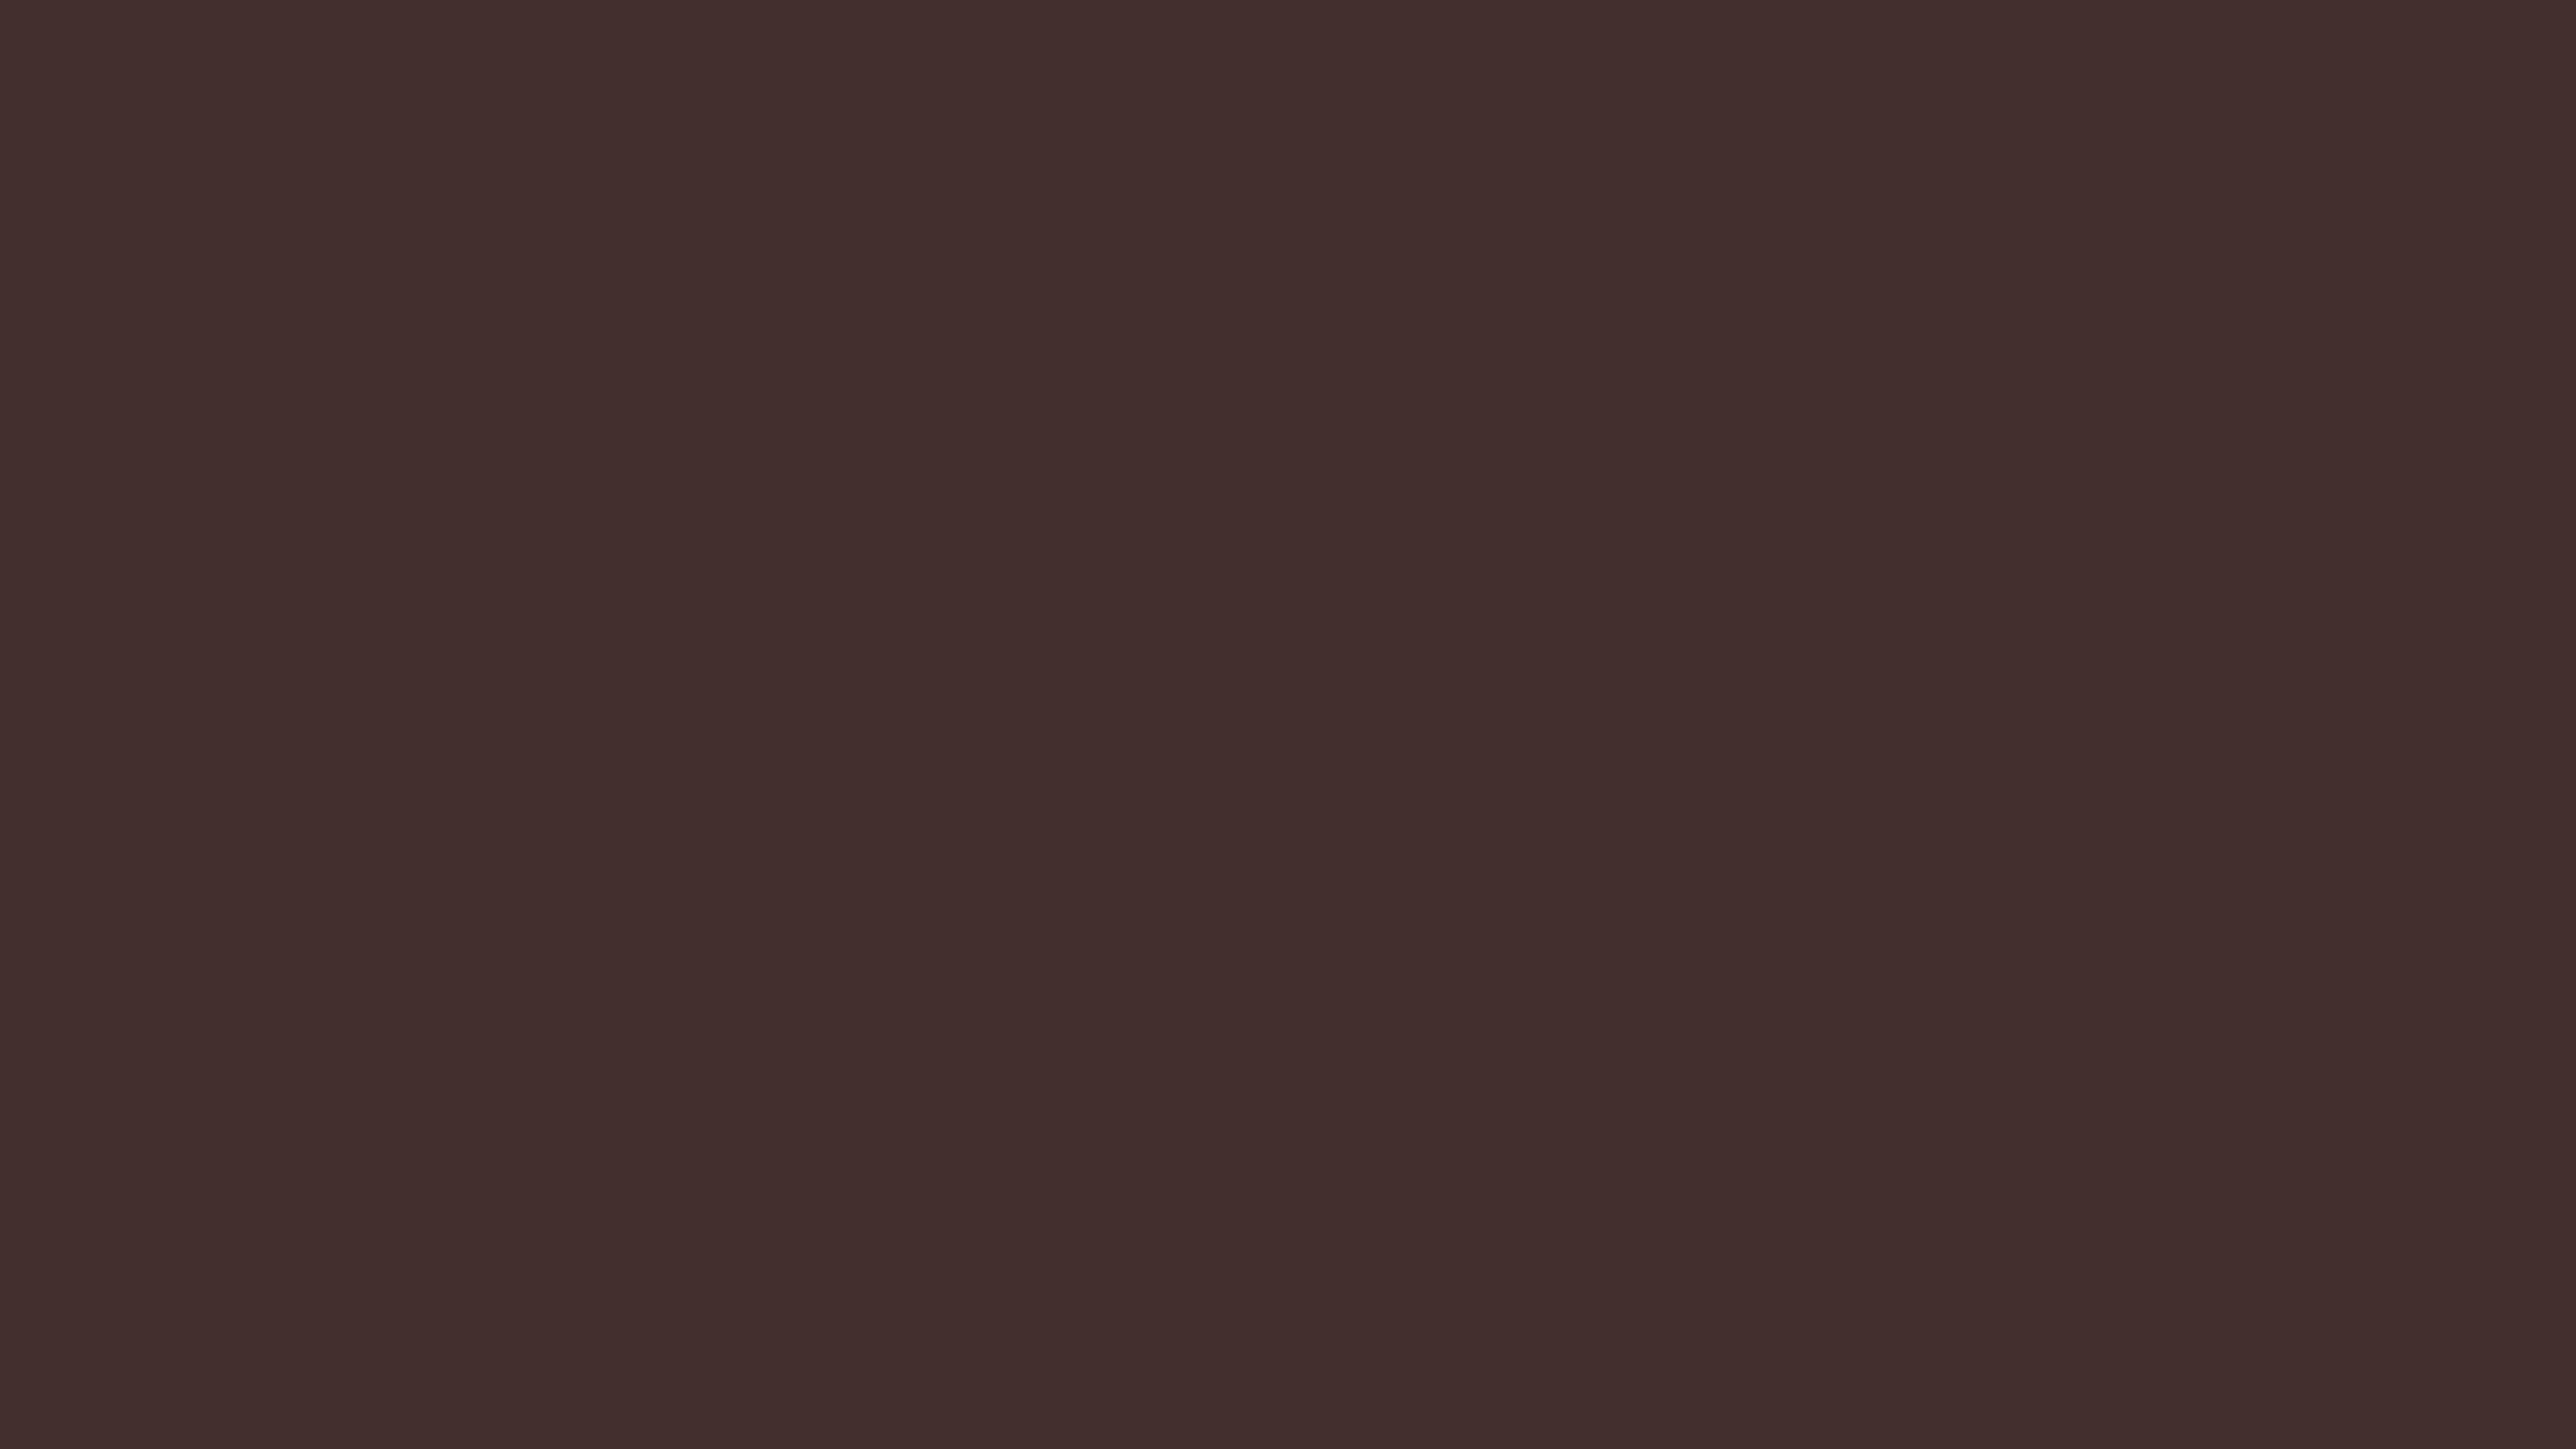 5120x2880 Old Burgundy Solid Color Background